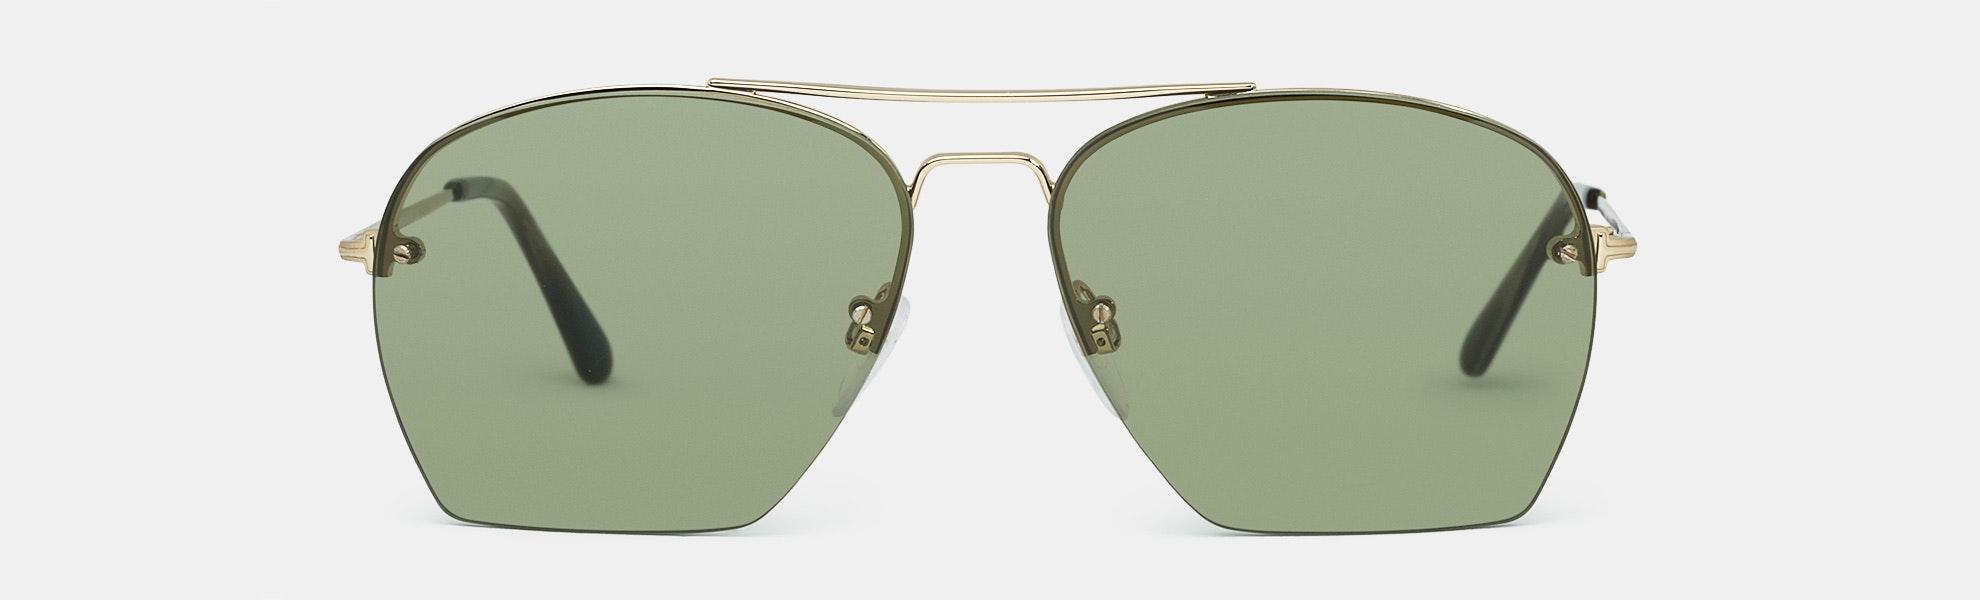 Tom Ford Whelan Sunglasses